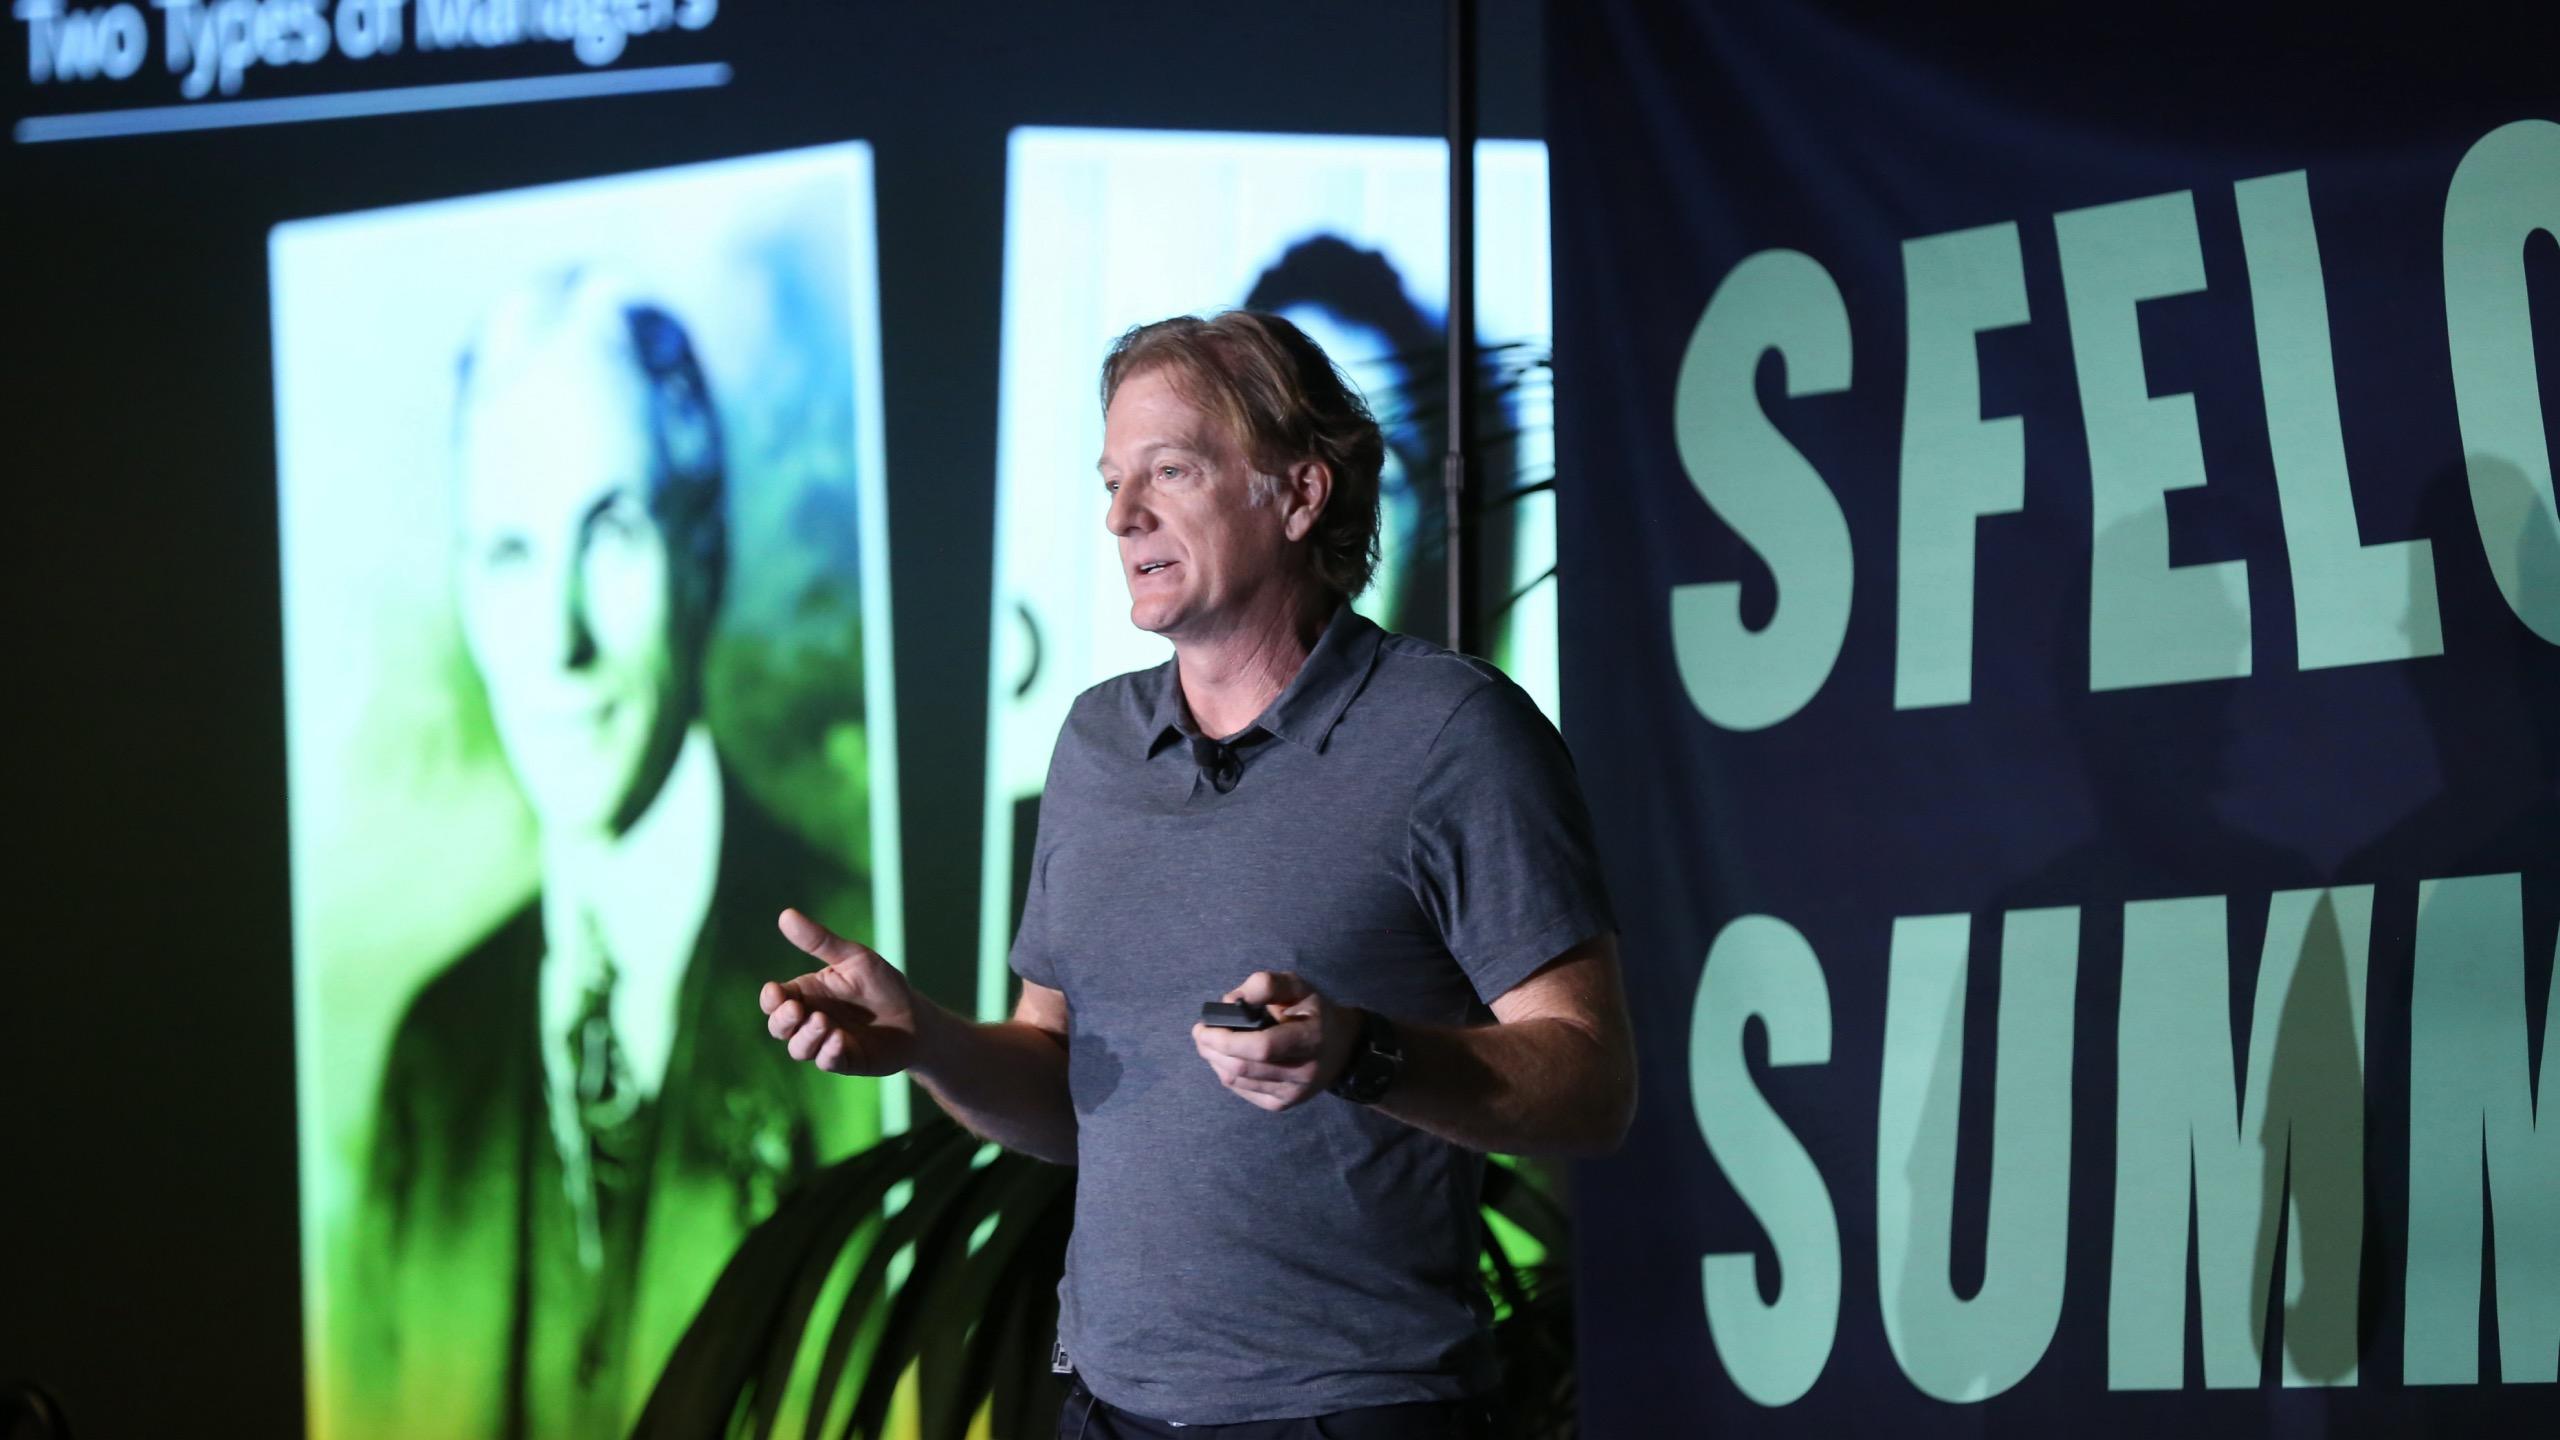 SFELC - Keynote - Managing Creative Teams